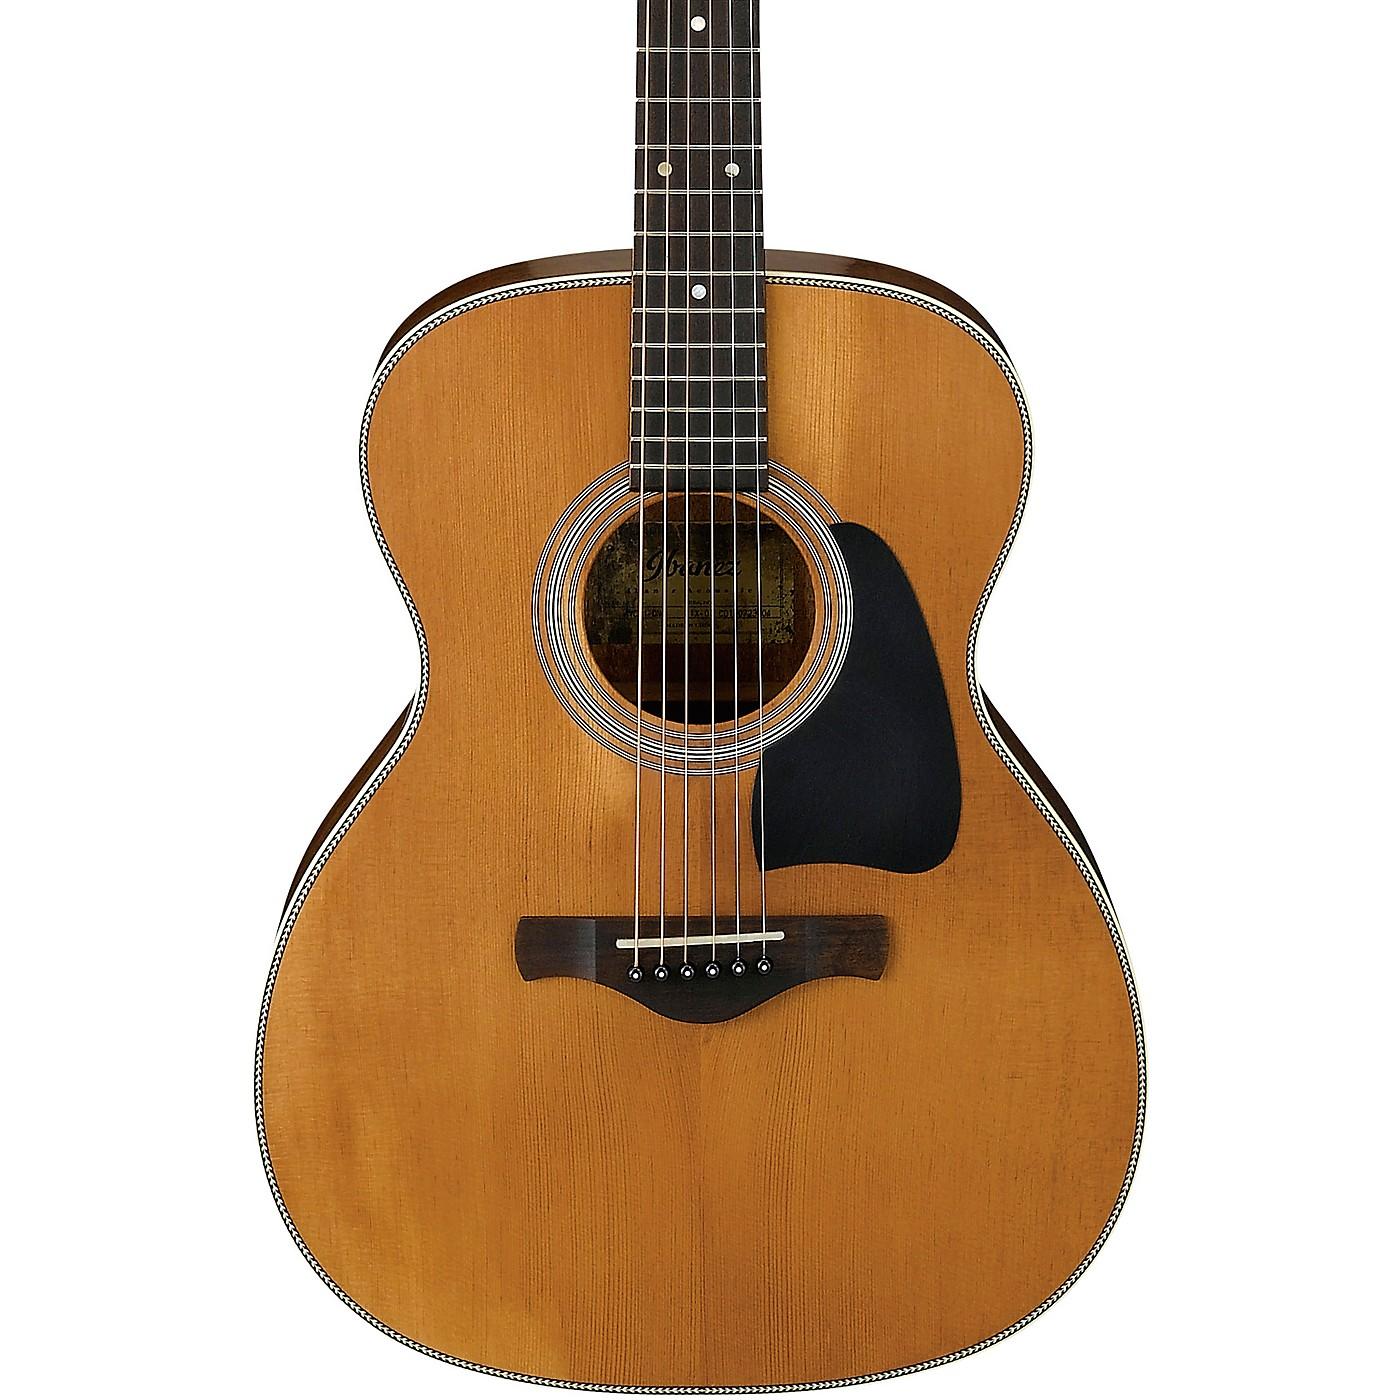 Ibanez AVC11 Artwood Vintage Grand Concert Acoustic Guitar thumbnail